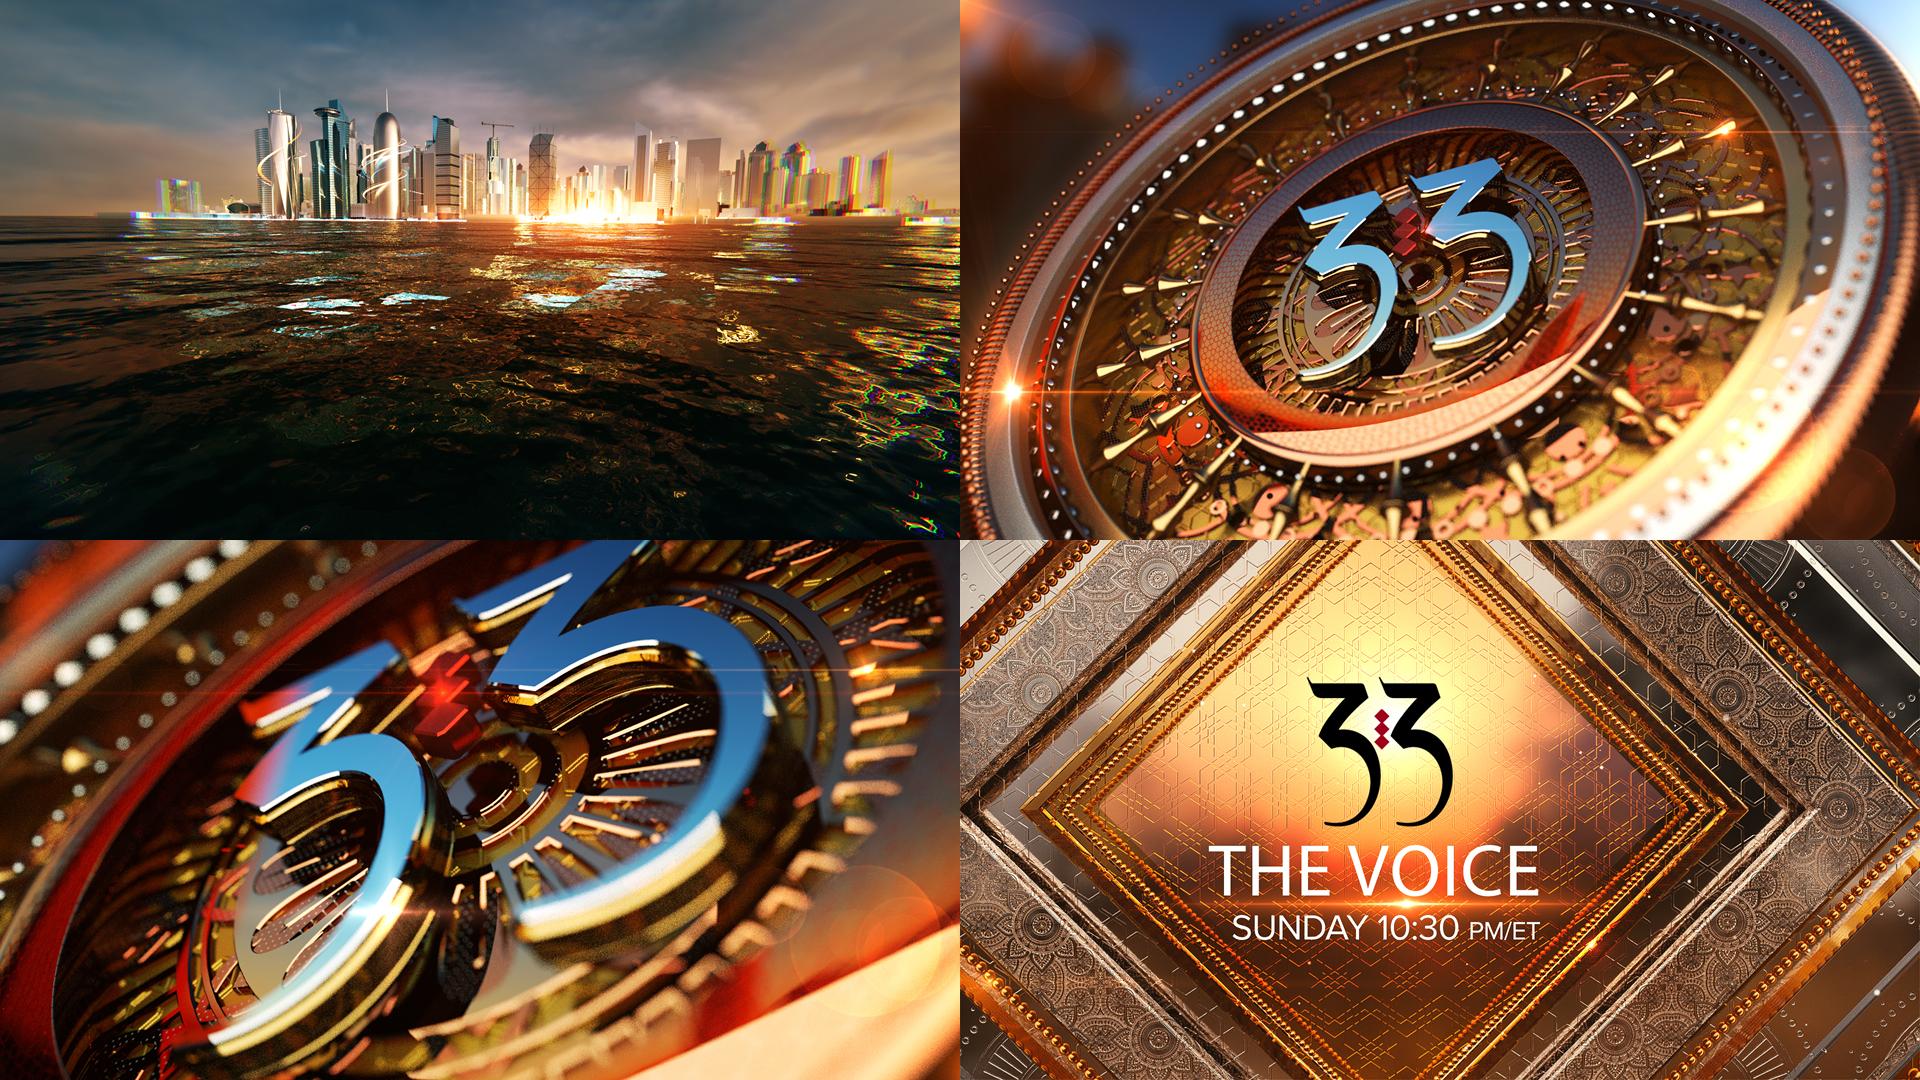 Broadcast_Design_Renderon_Qatar.jpg